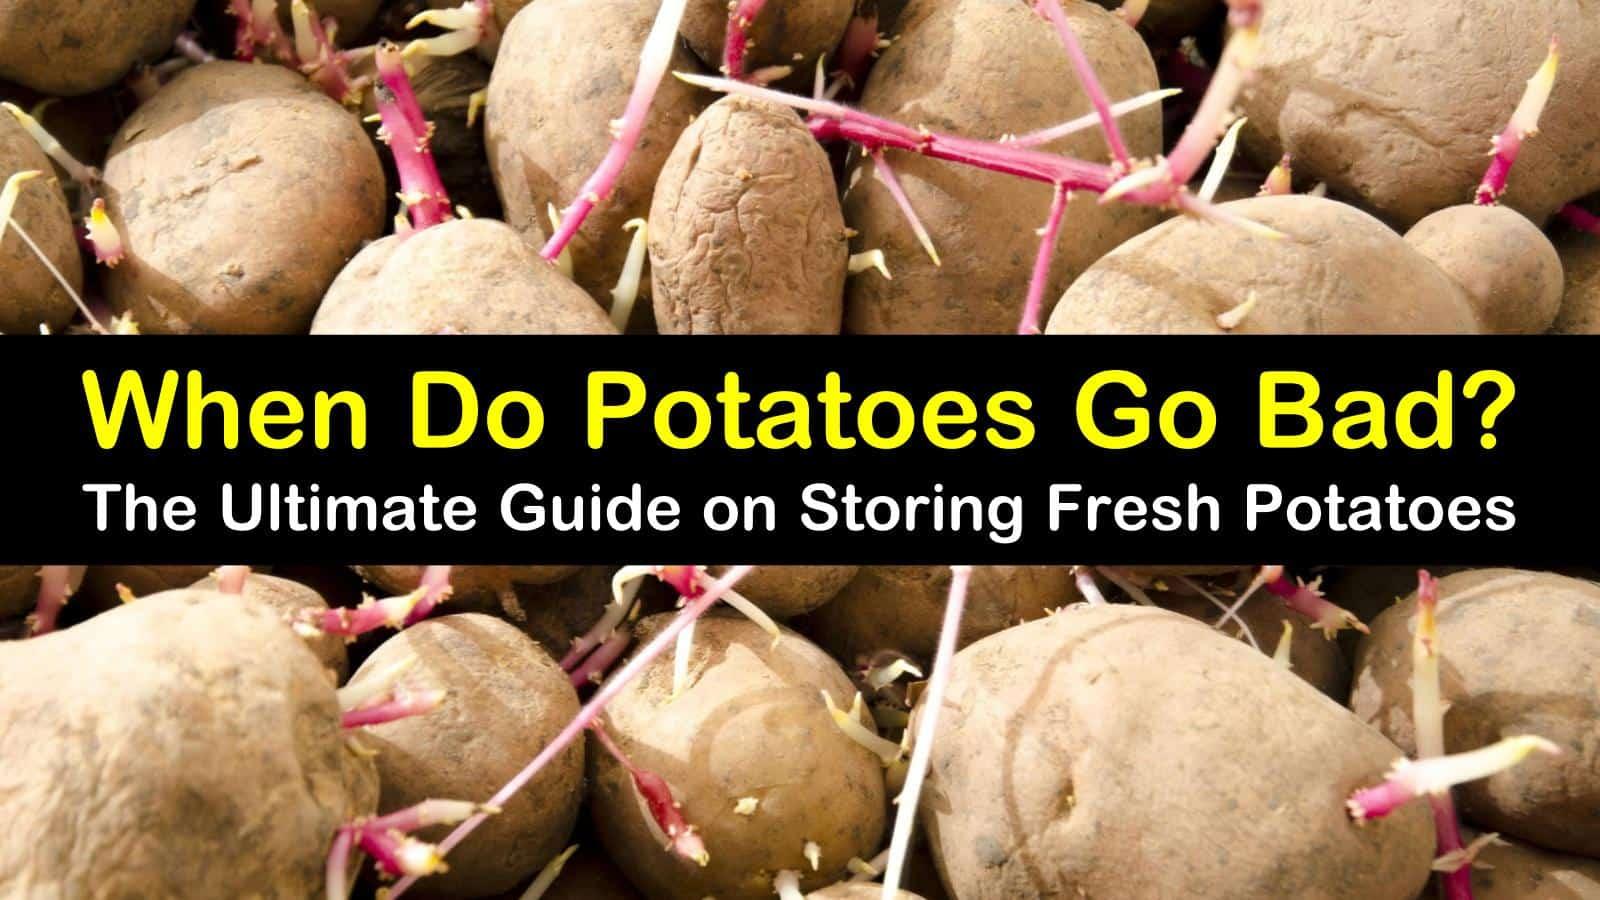 when do potatoes go bad titleimg1